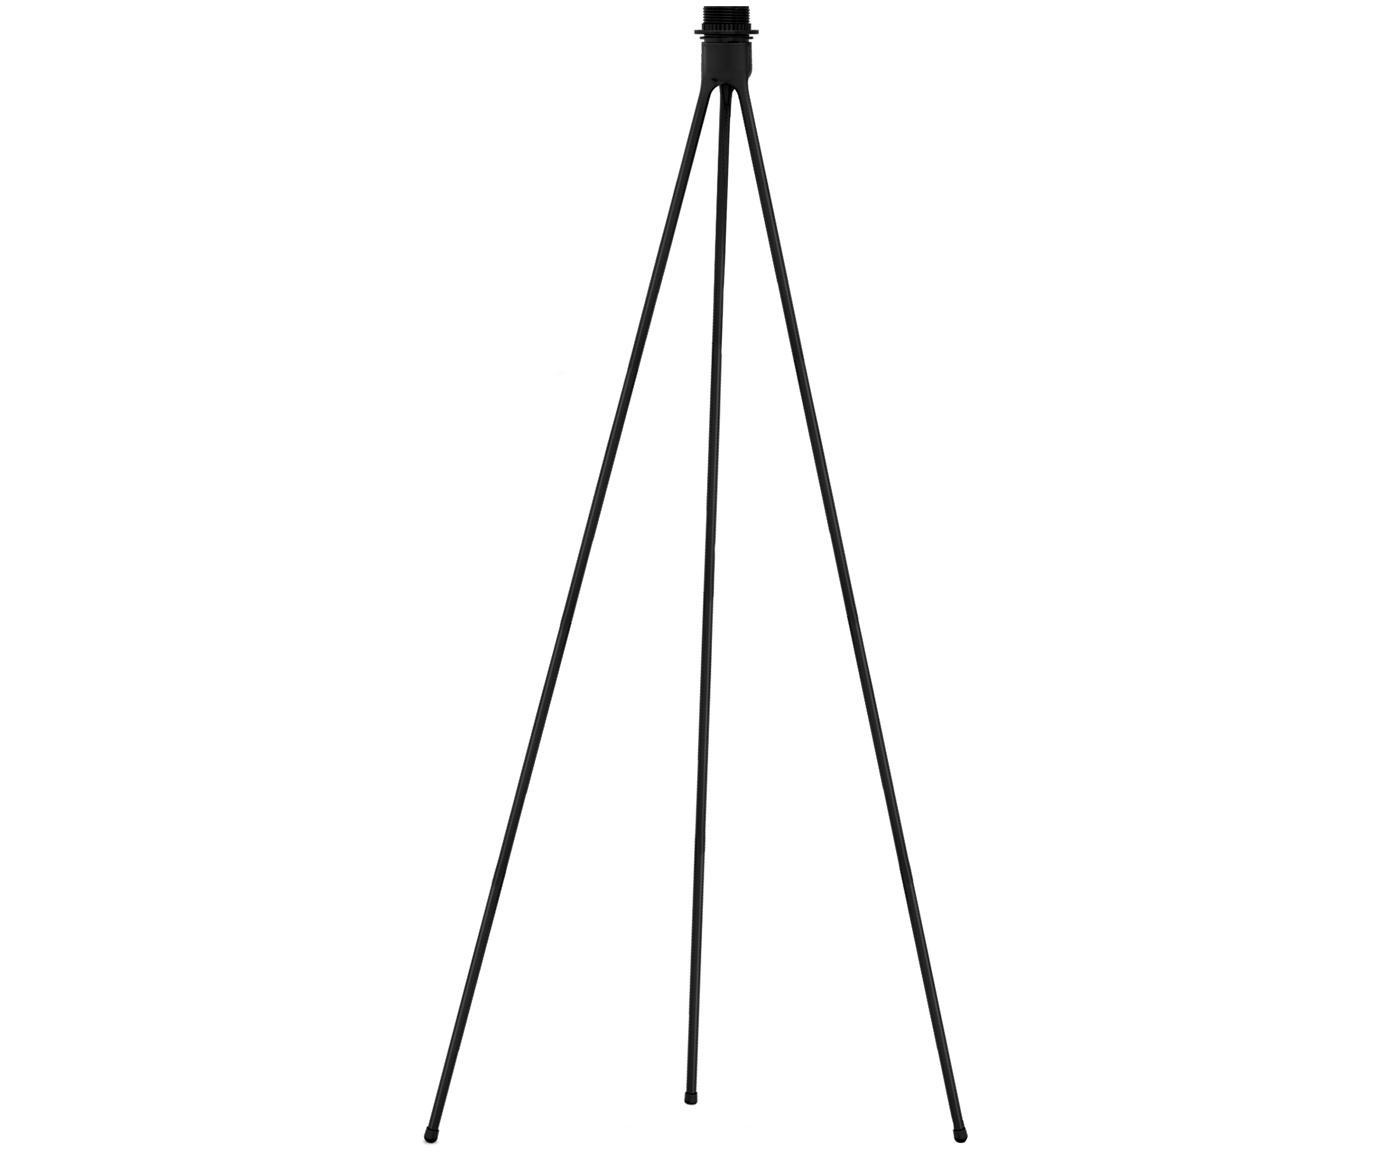 Stehleuchtenfuss Tripod, Schwarz, Ø 50 x H 109 cm